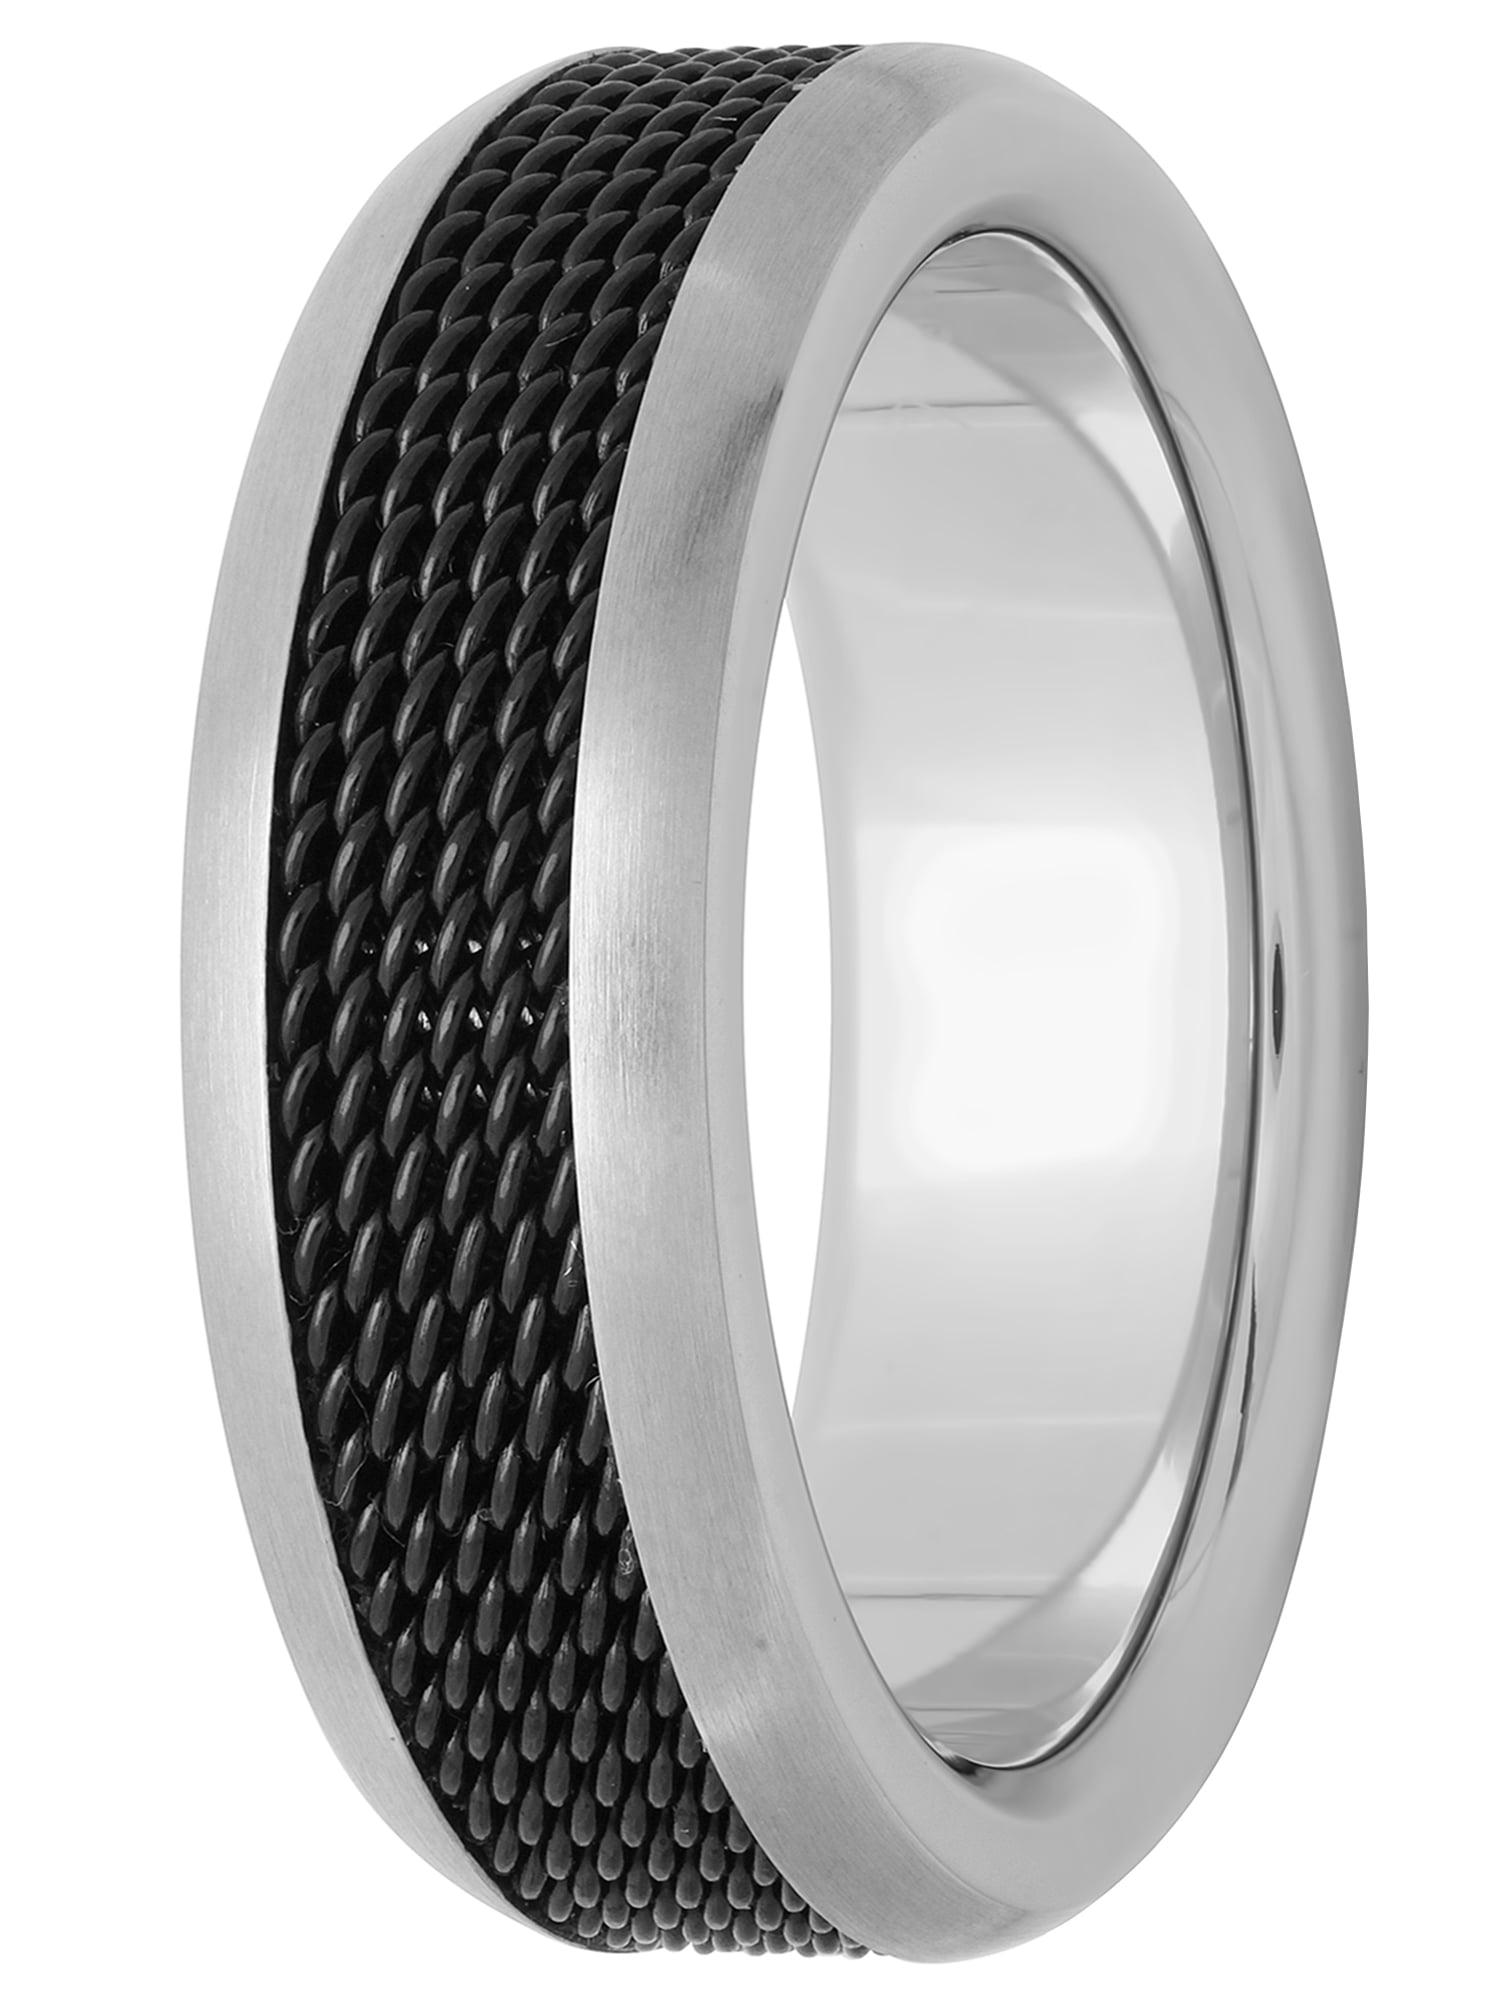 Men's Stainless Steel 8mm Two-Tone Black Mesh Wedding Band - Mens Ring